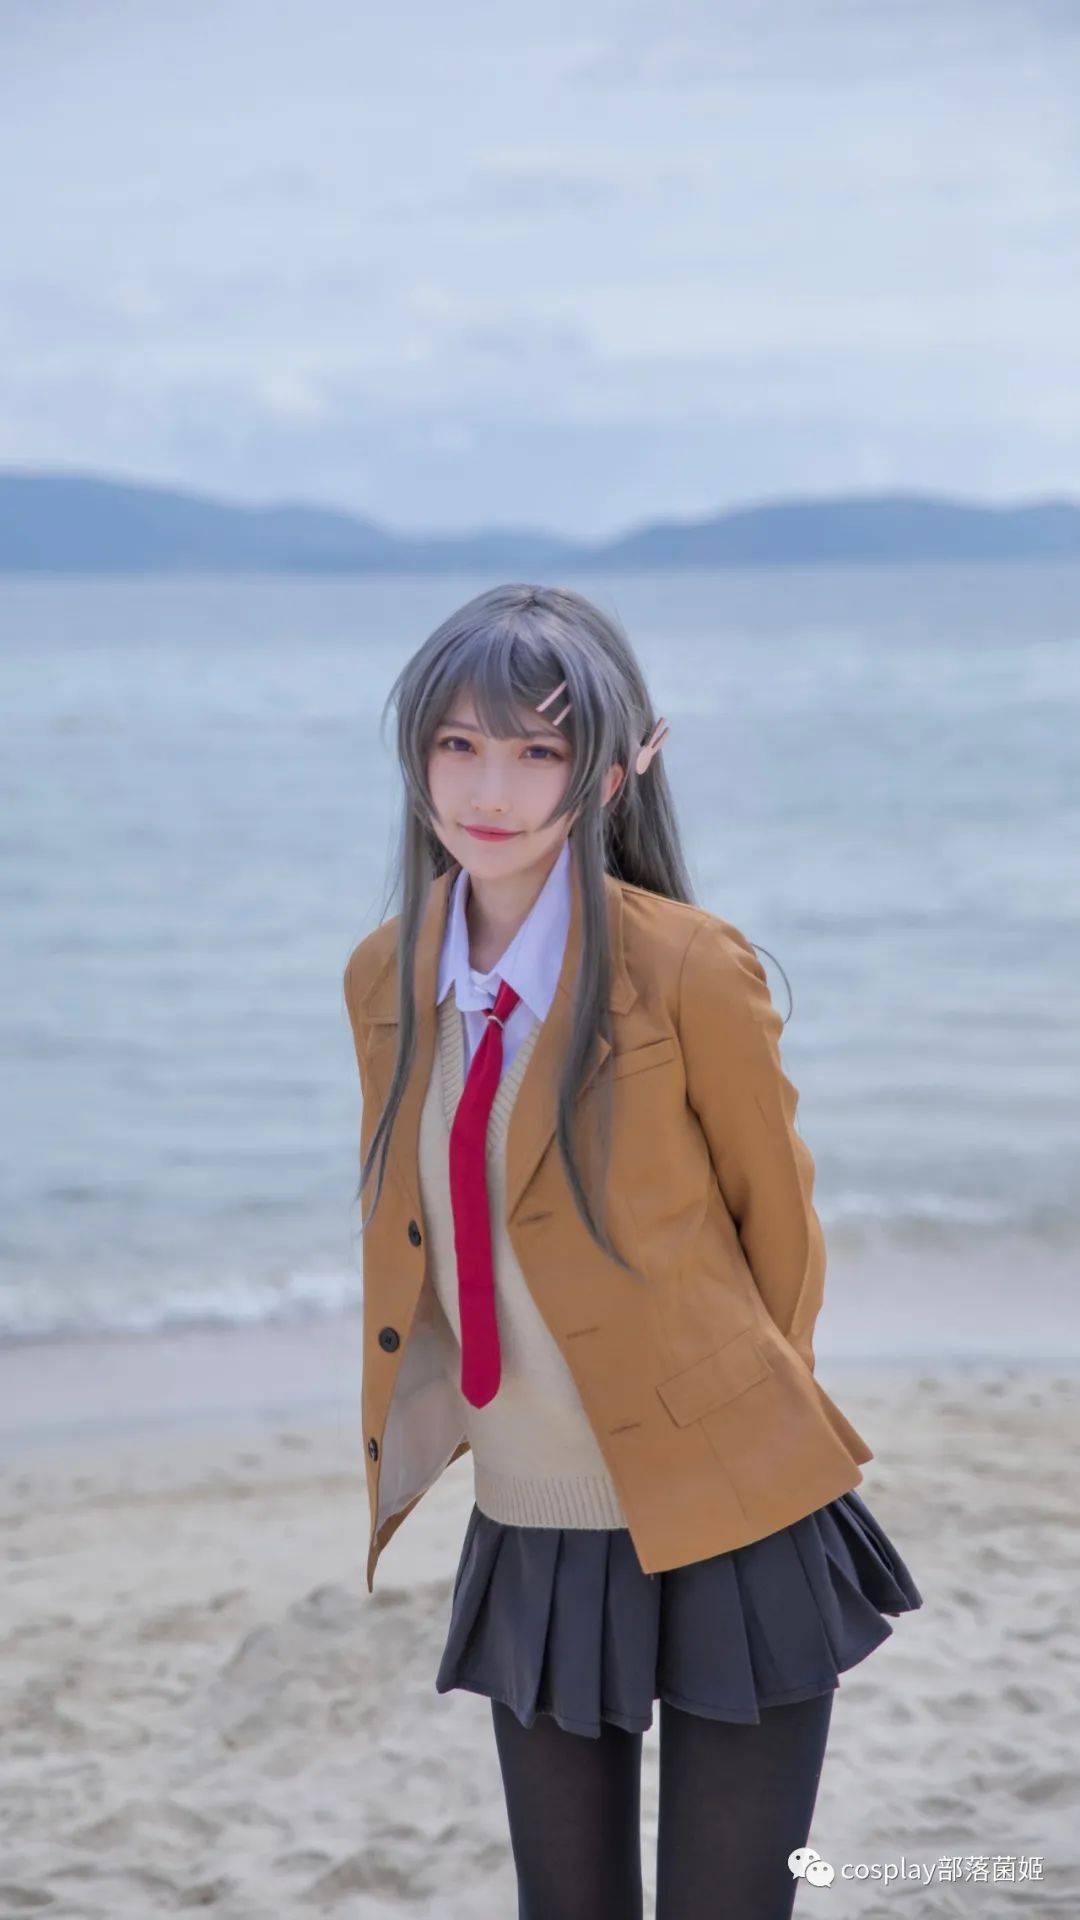 cos:兔女郎樱岛麻衣cos正片@兔x2,踩在柔软的沙滩上